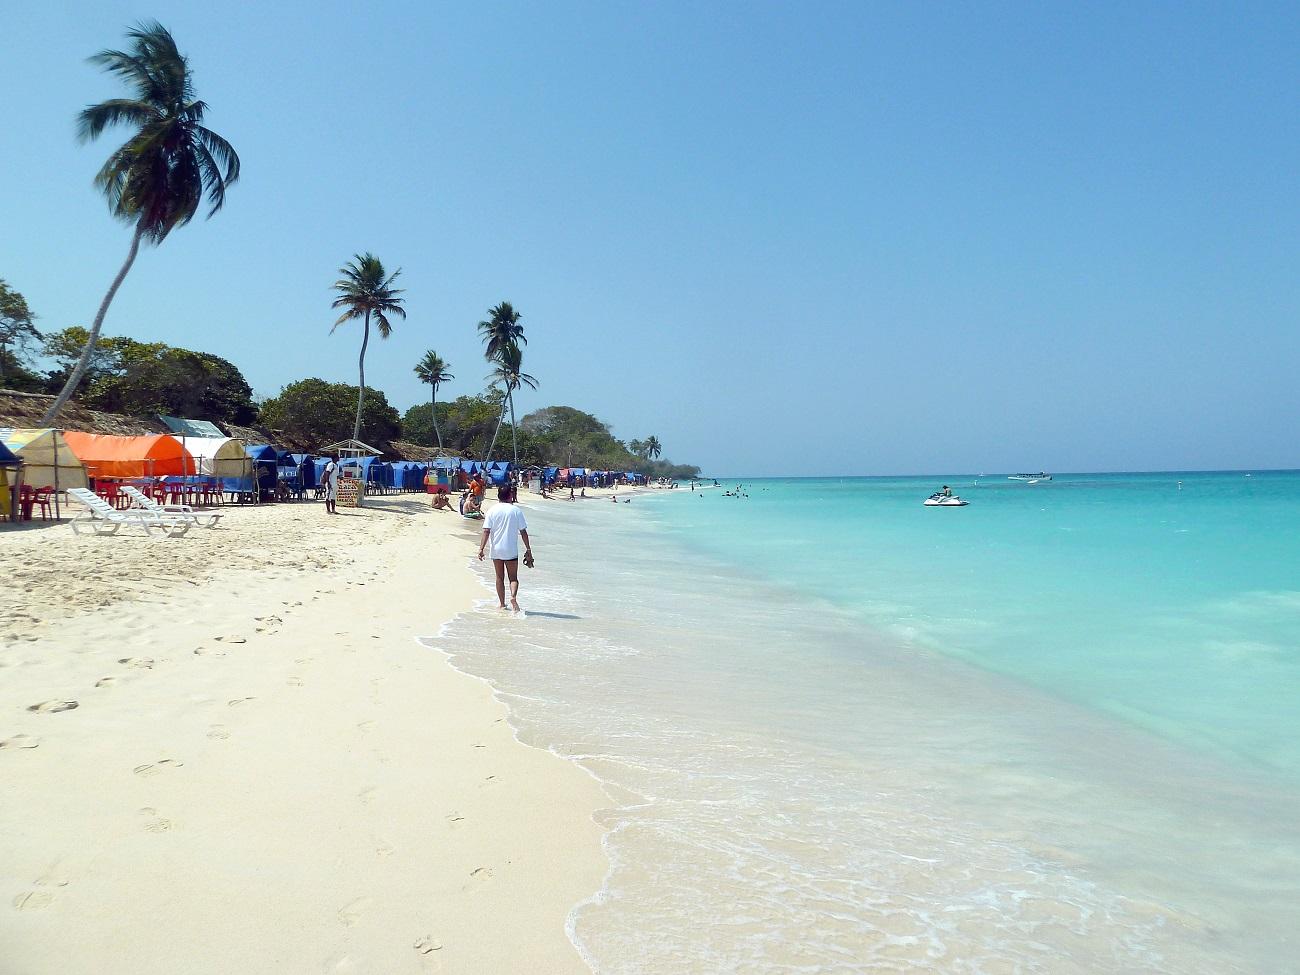 Plaja de Bocagrande, Cartagena, Columbia